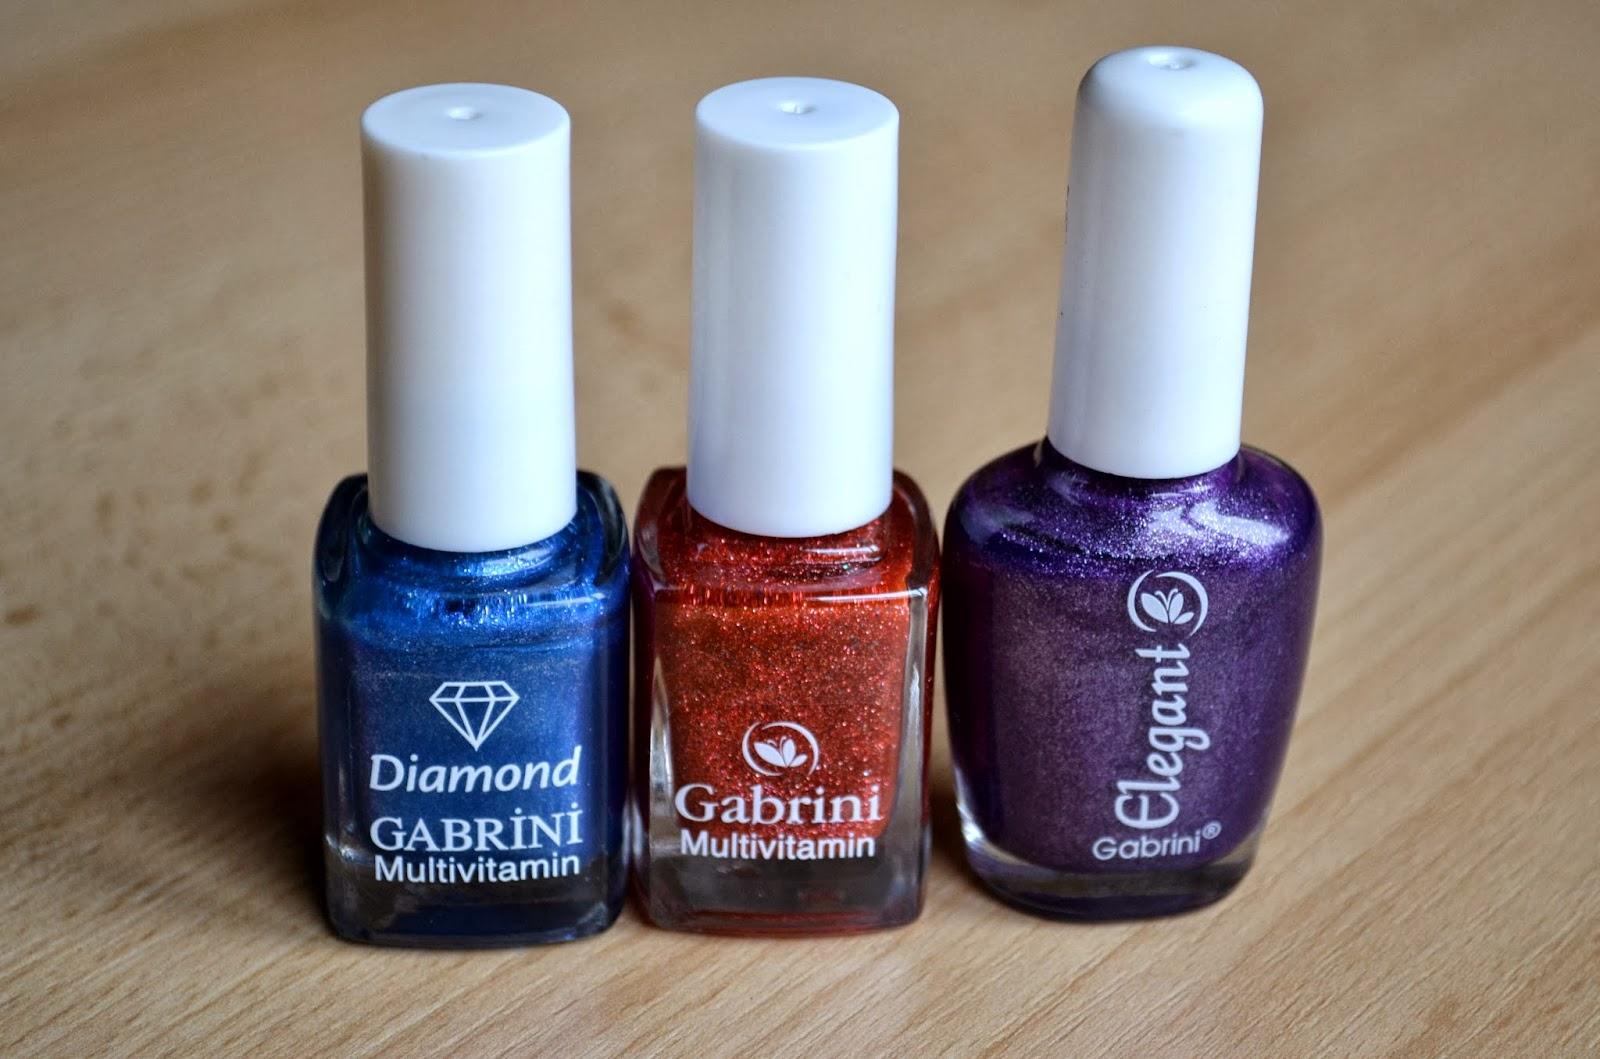 Gabrini nail polishes